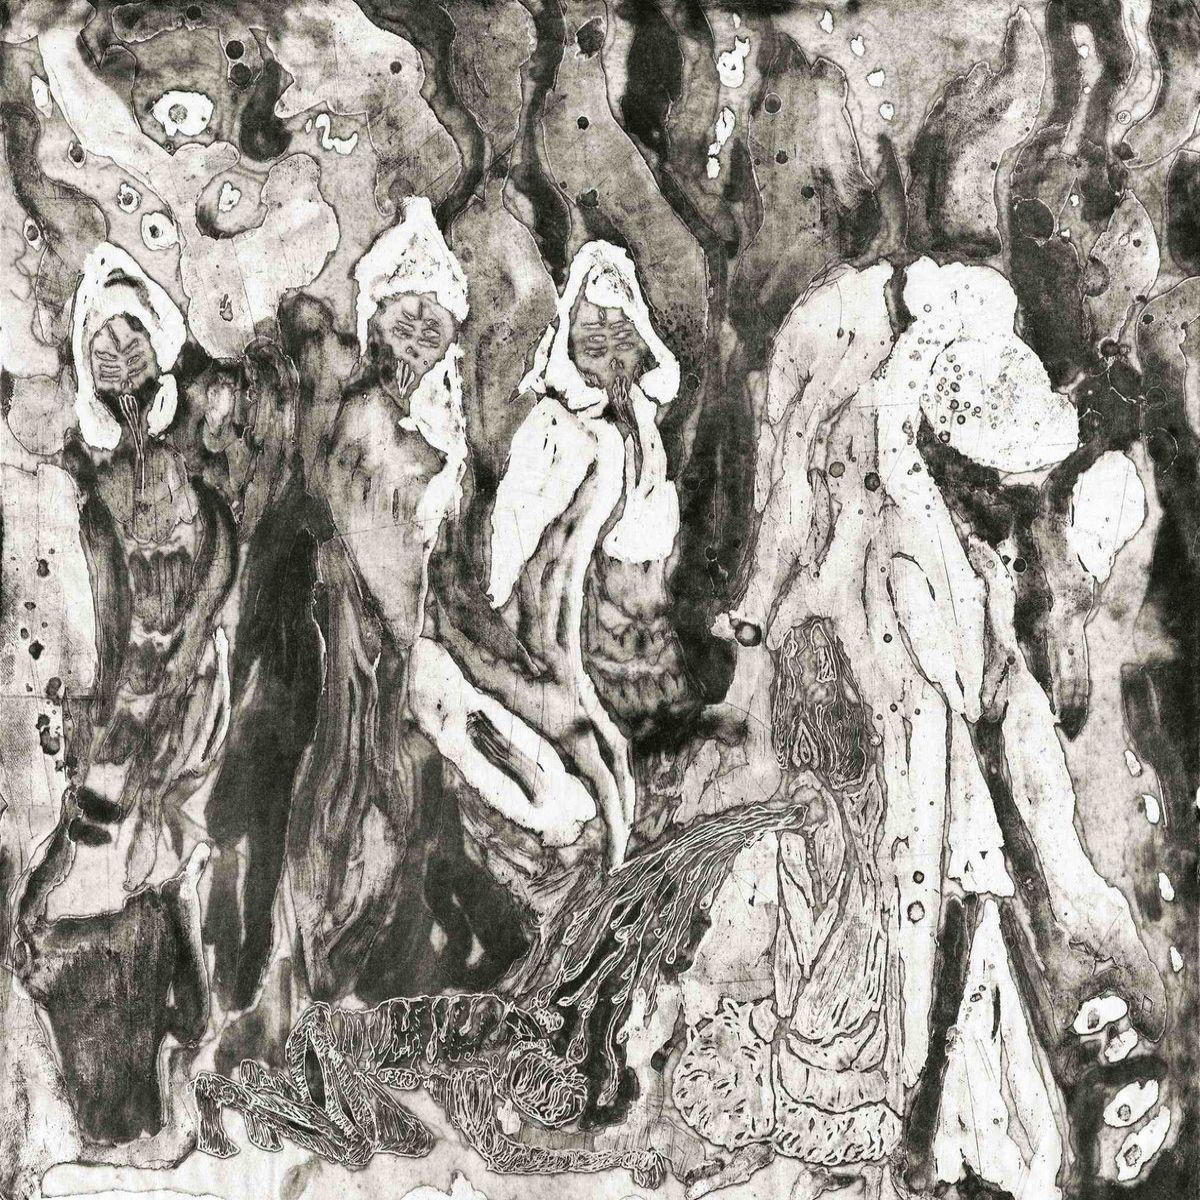 Dire Omen - Wresting the Revelation of Futility